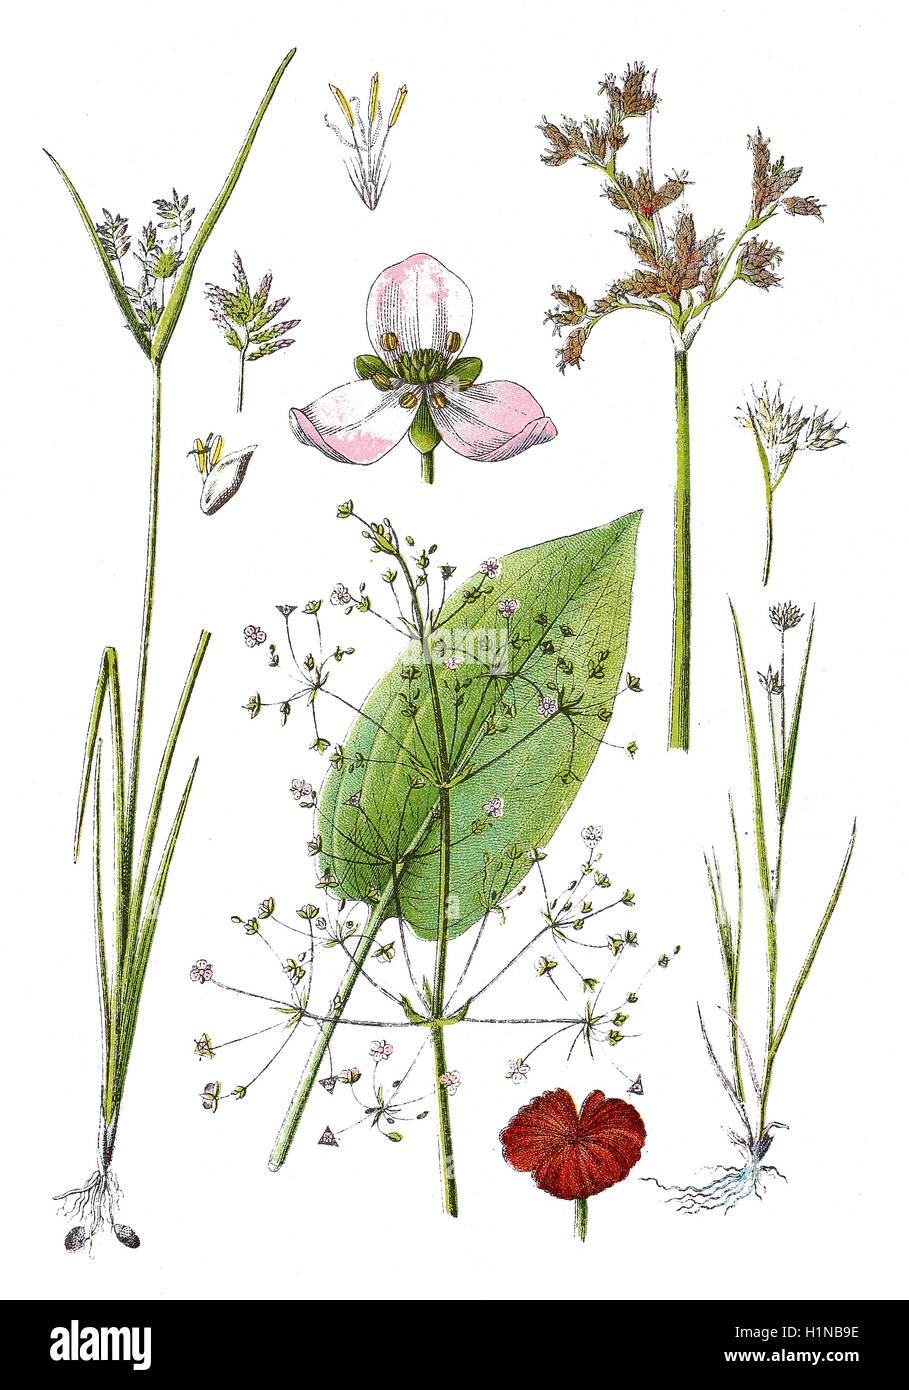 white beak-sedge, Rhynchospora alba (right bottem), lakeshore bulrush, Scirpus lacustris (right top),  chufa sedge, Stock Photo